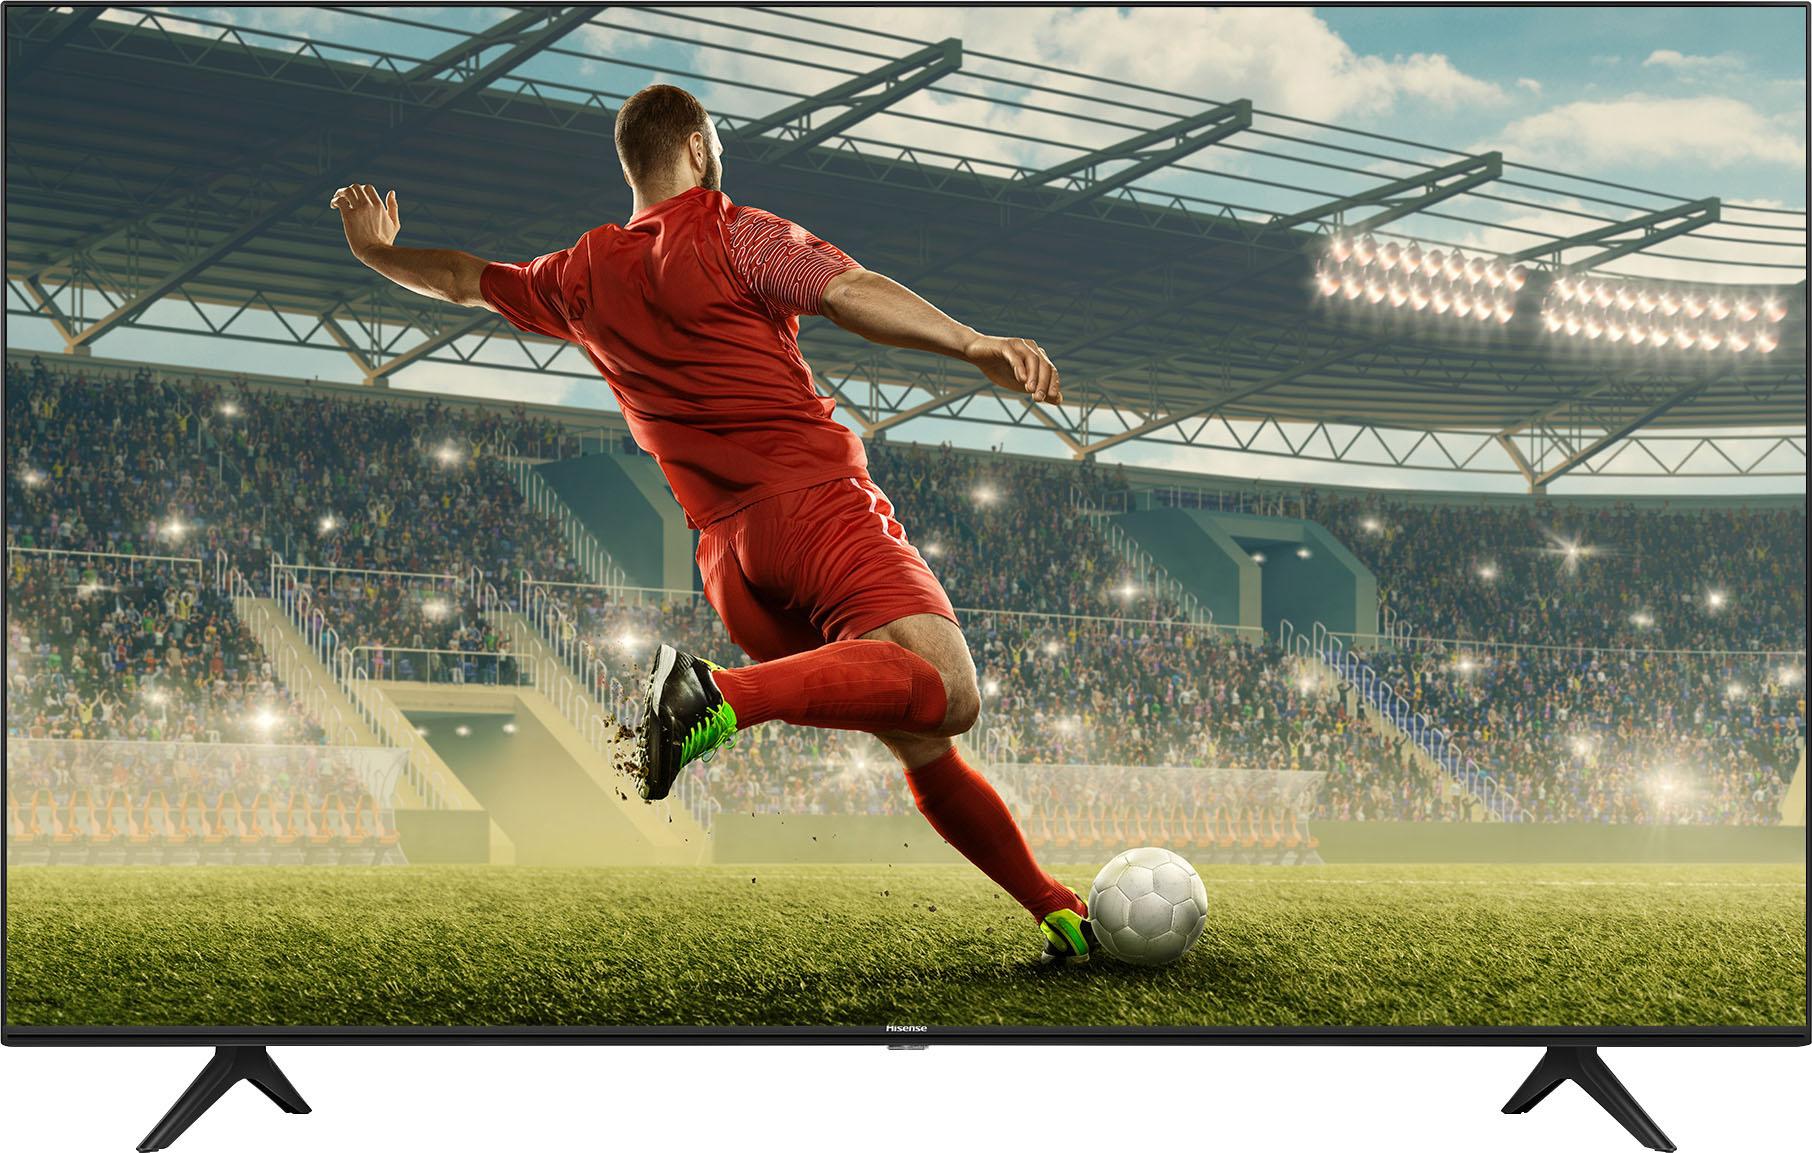 Hisense LED-Fernseher 43AE7010F , 108 cm 43 , 4K Ultra HD, Smart-TV, 4K Ultra HD